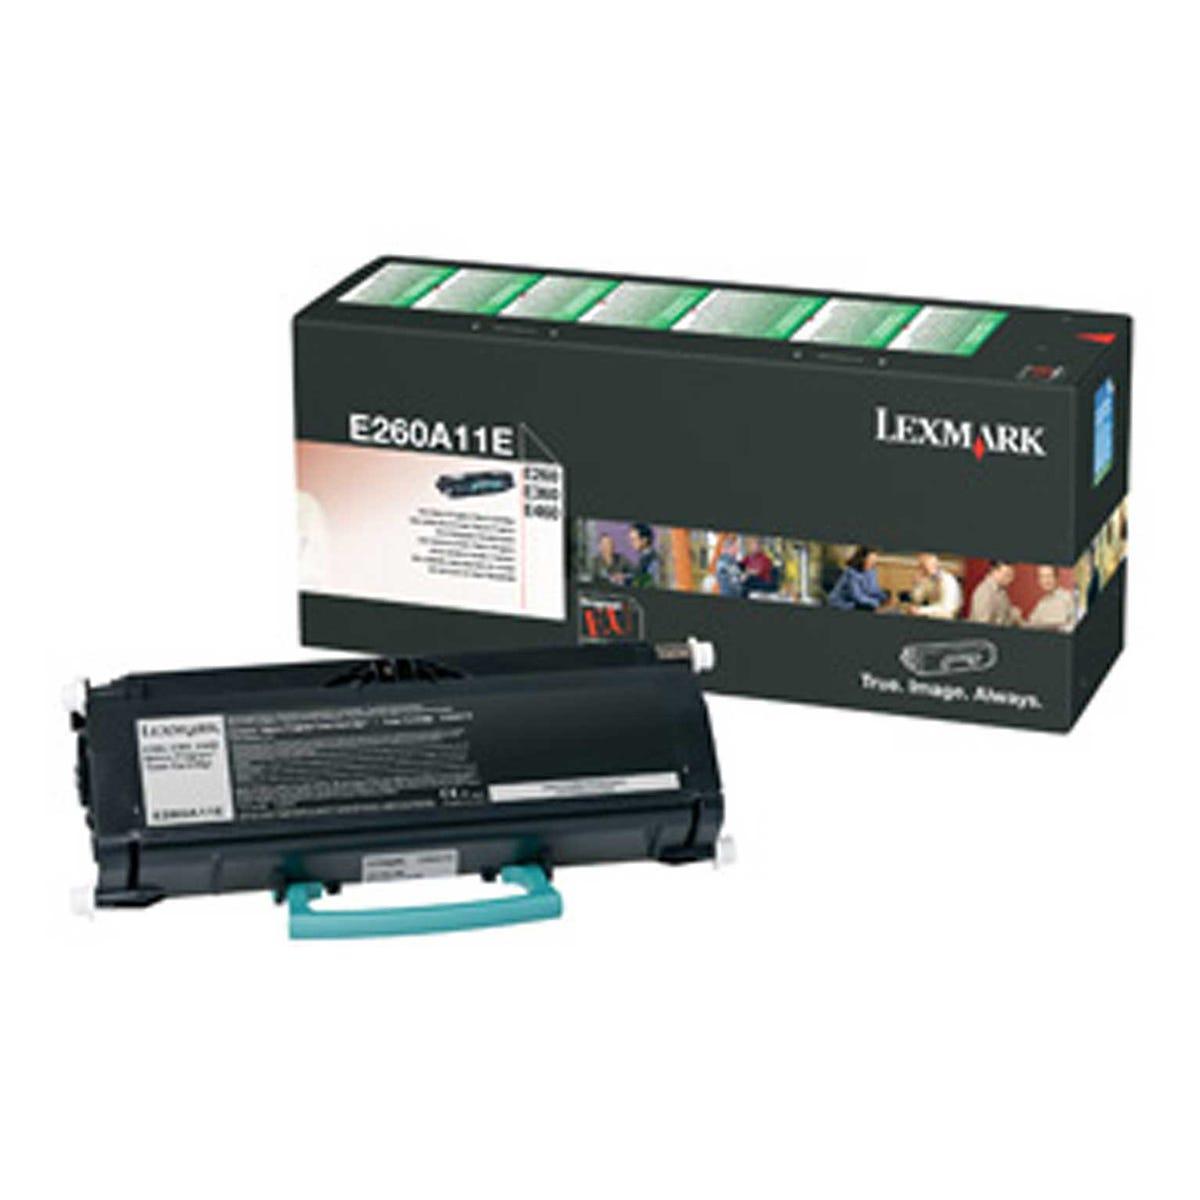 Image of Lexmark E260 Return Ink Toner Cartridge Black, Black